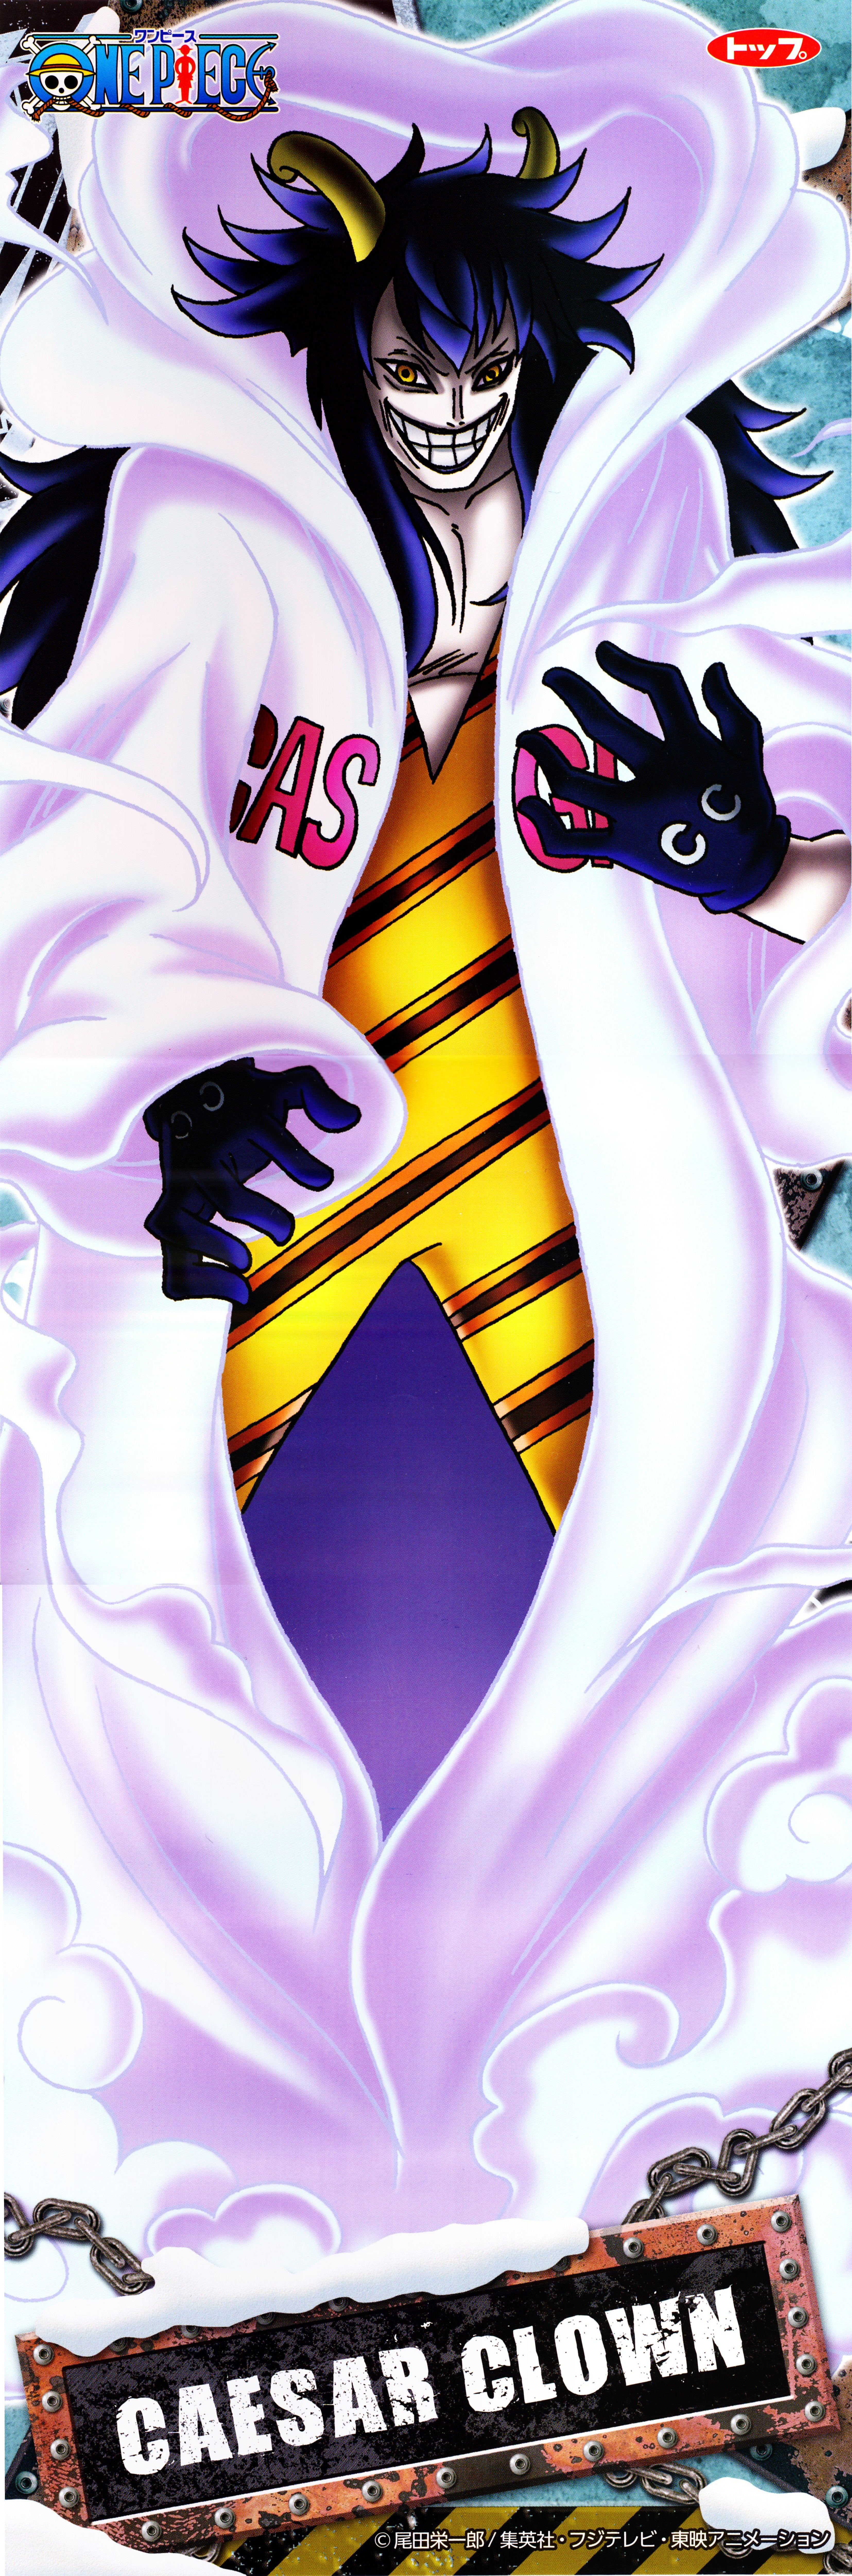 Caesar Clown - ONE PIECE - Image #1656567 - Zerochan Anime ...